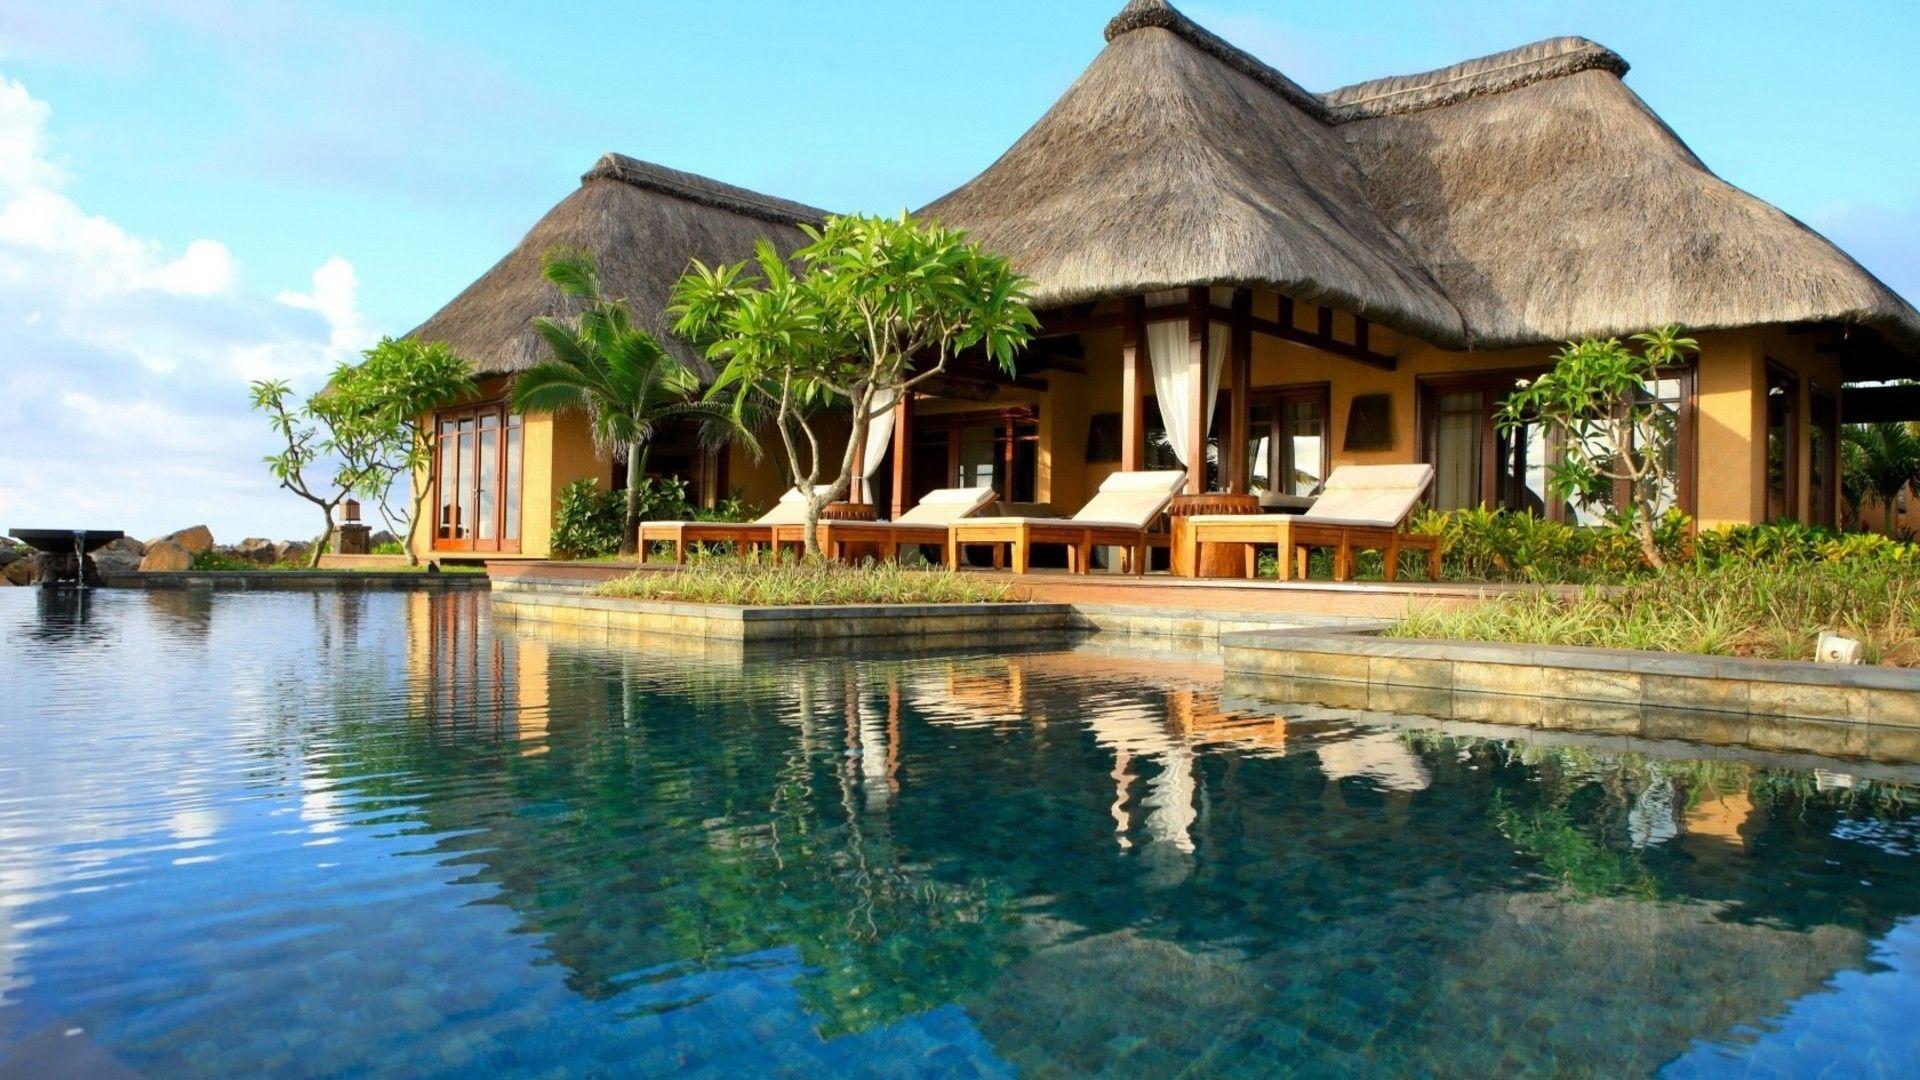 16 Luxury Pubg Wallpaper Iphone 6: Exotic Beach Resorts Wallpaper